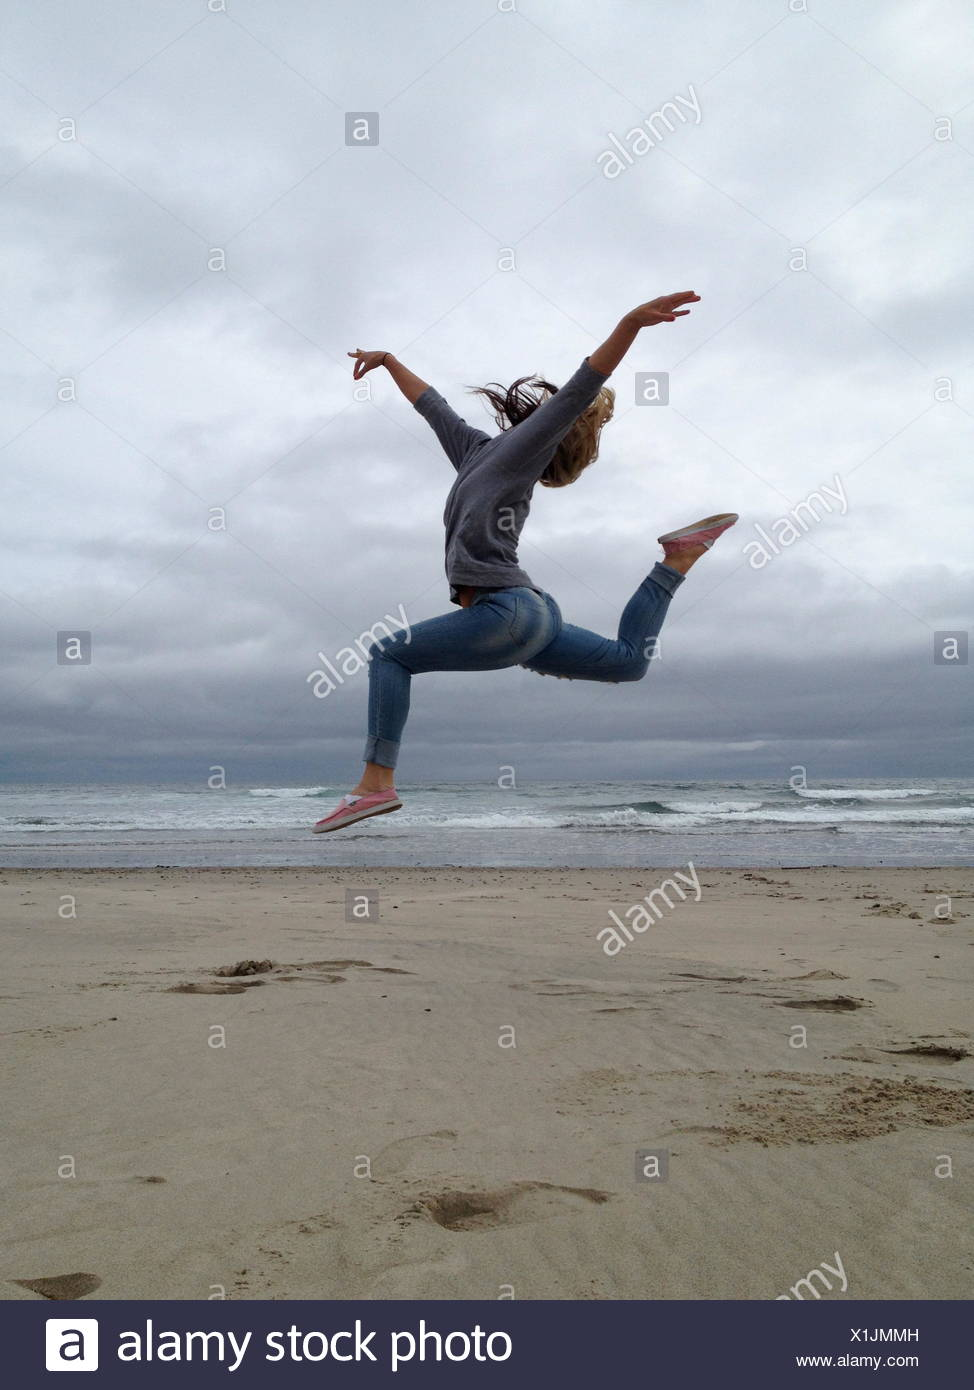 USA, Oregon, Tillamook County, Rockaway Beach, Young woman practicing ballet on beach - Stock Image